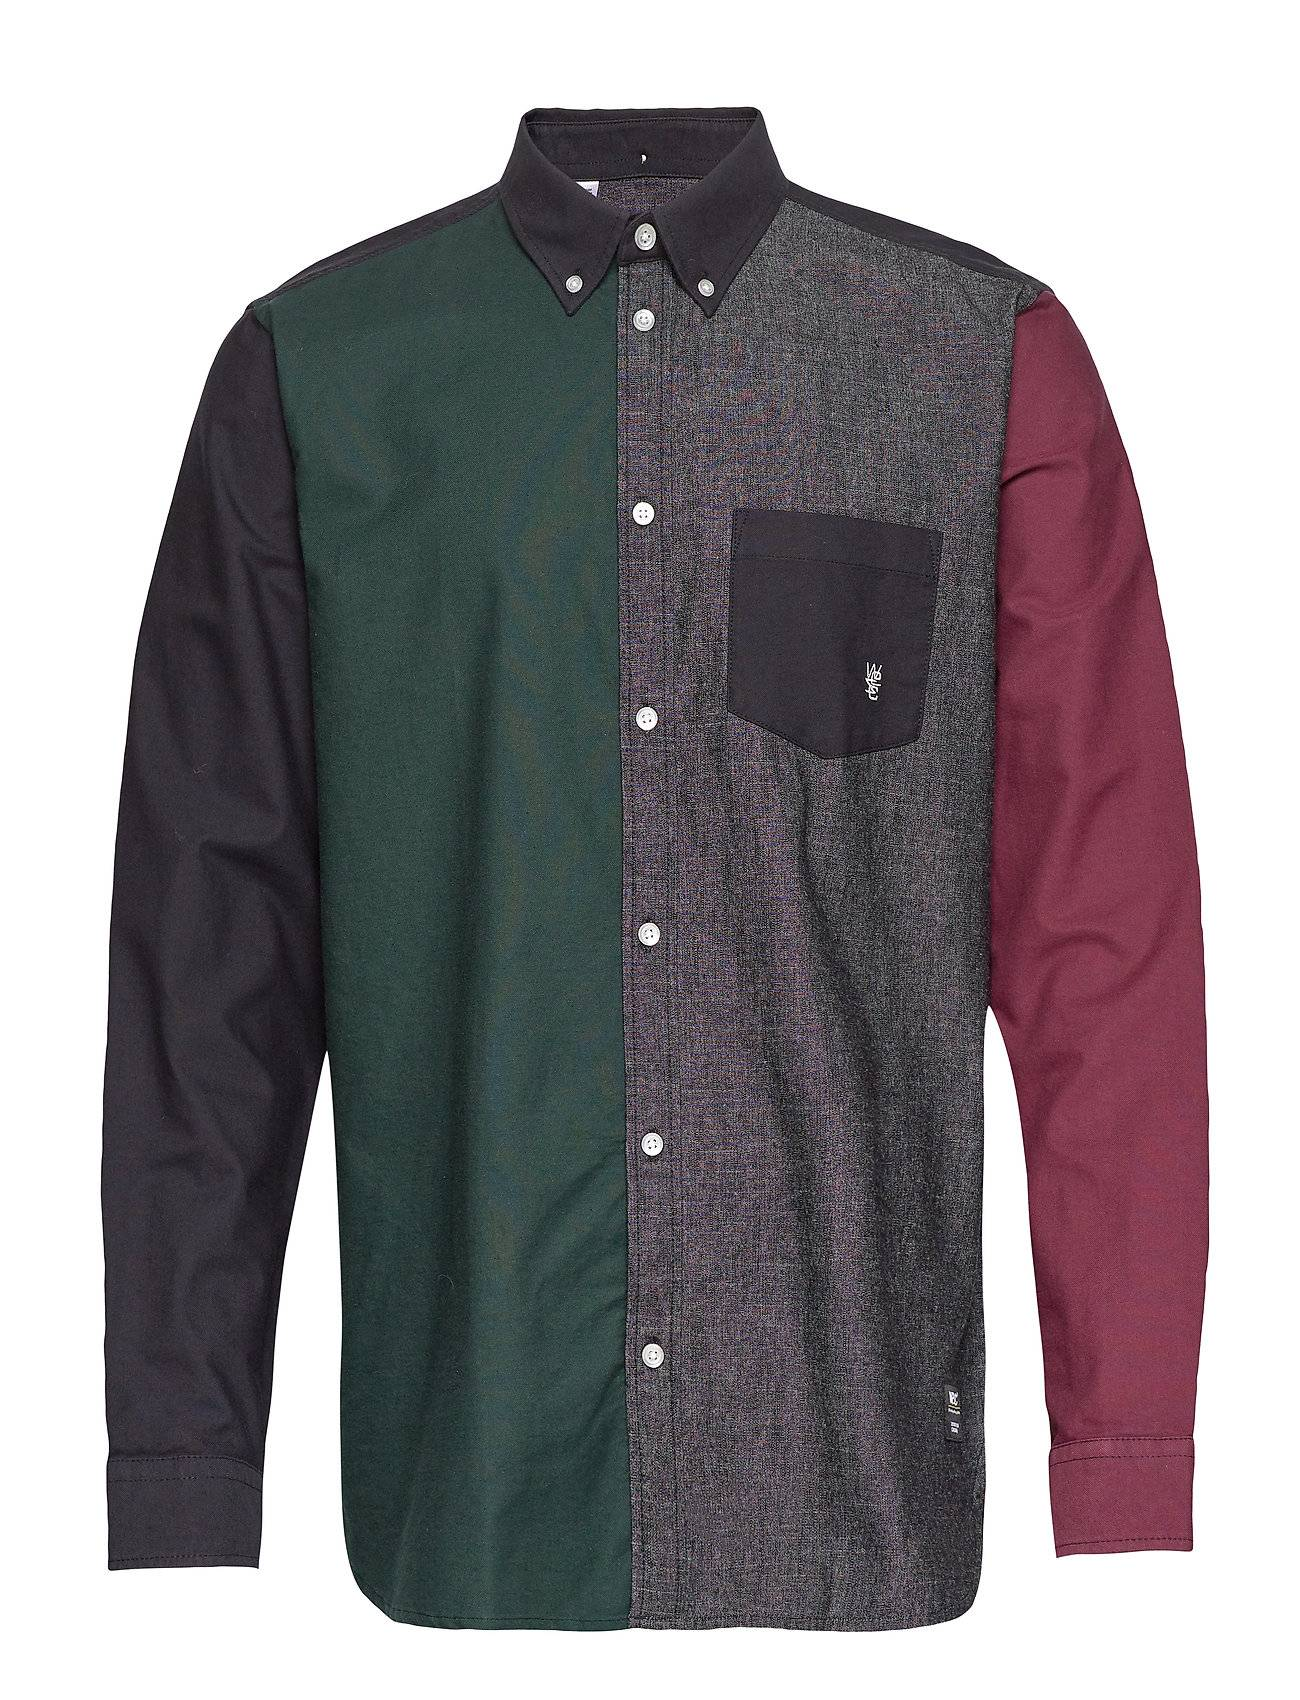 WeSC Oden Shirt Paita Rento Casual Monivärinen/Kuvioitu WeSC